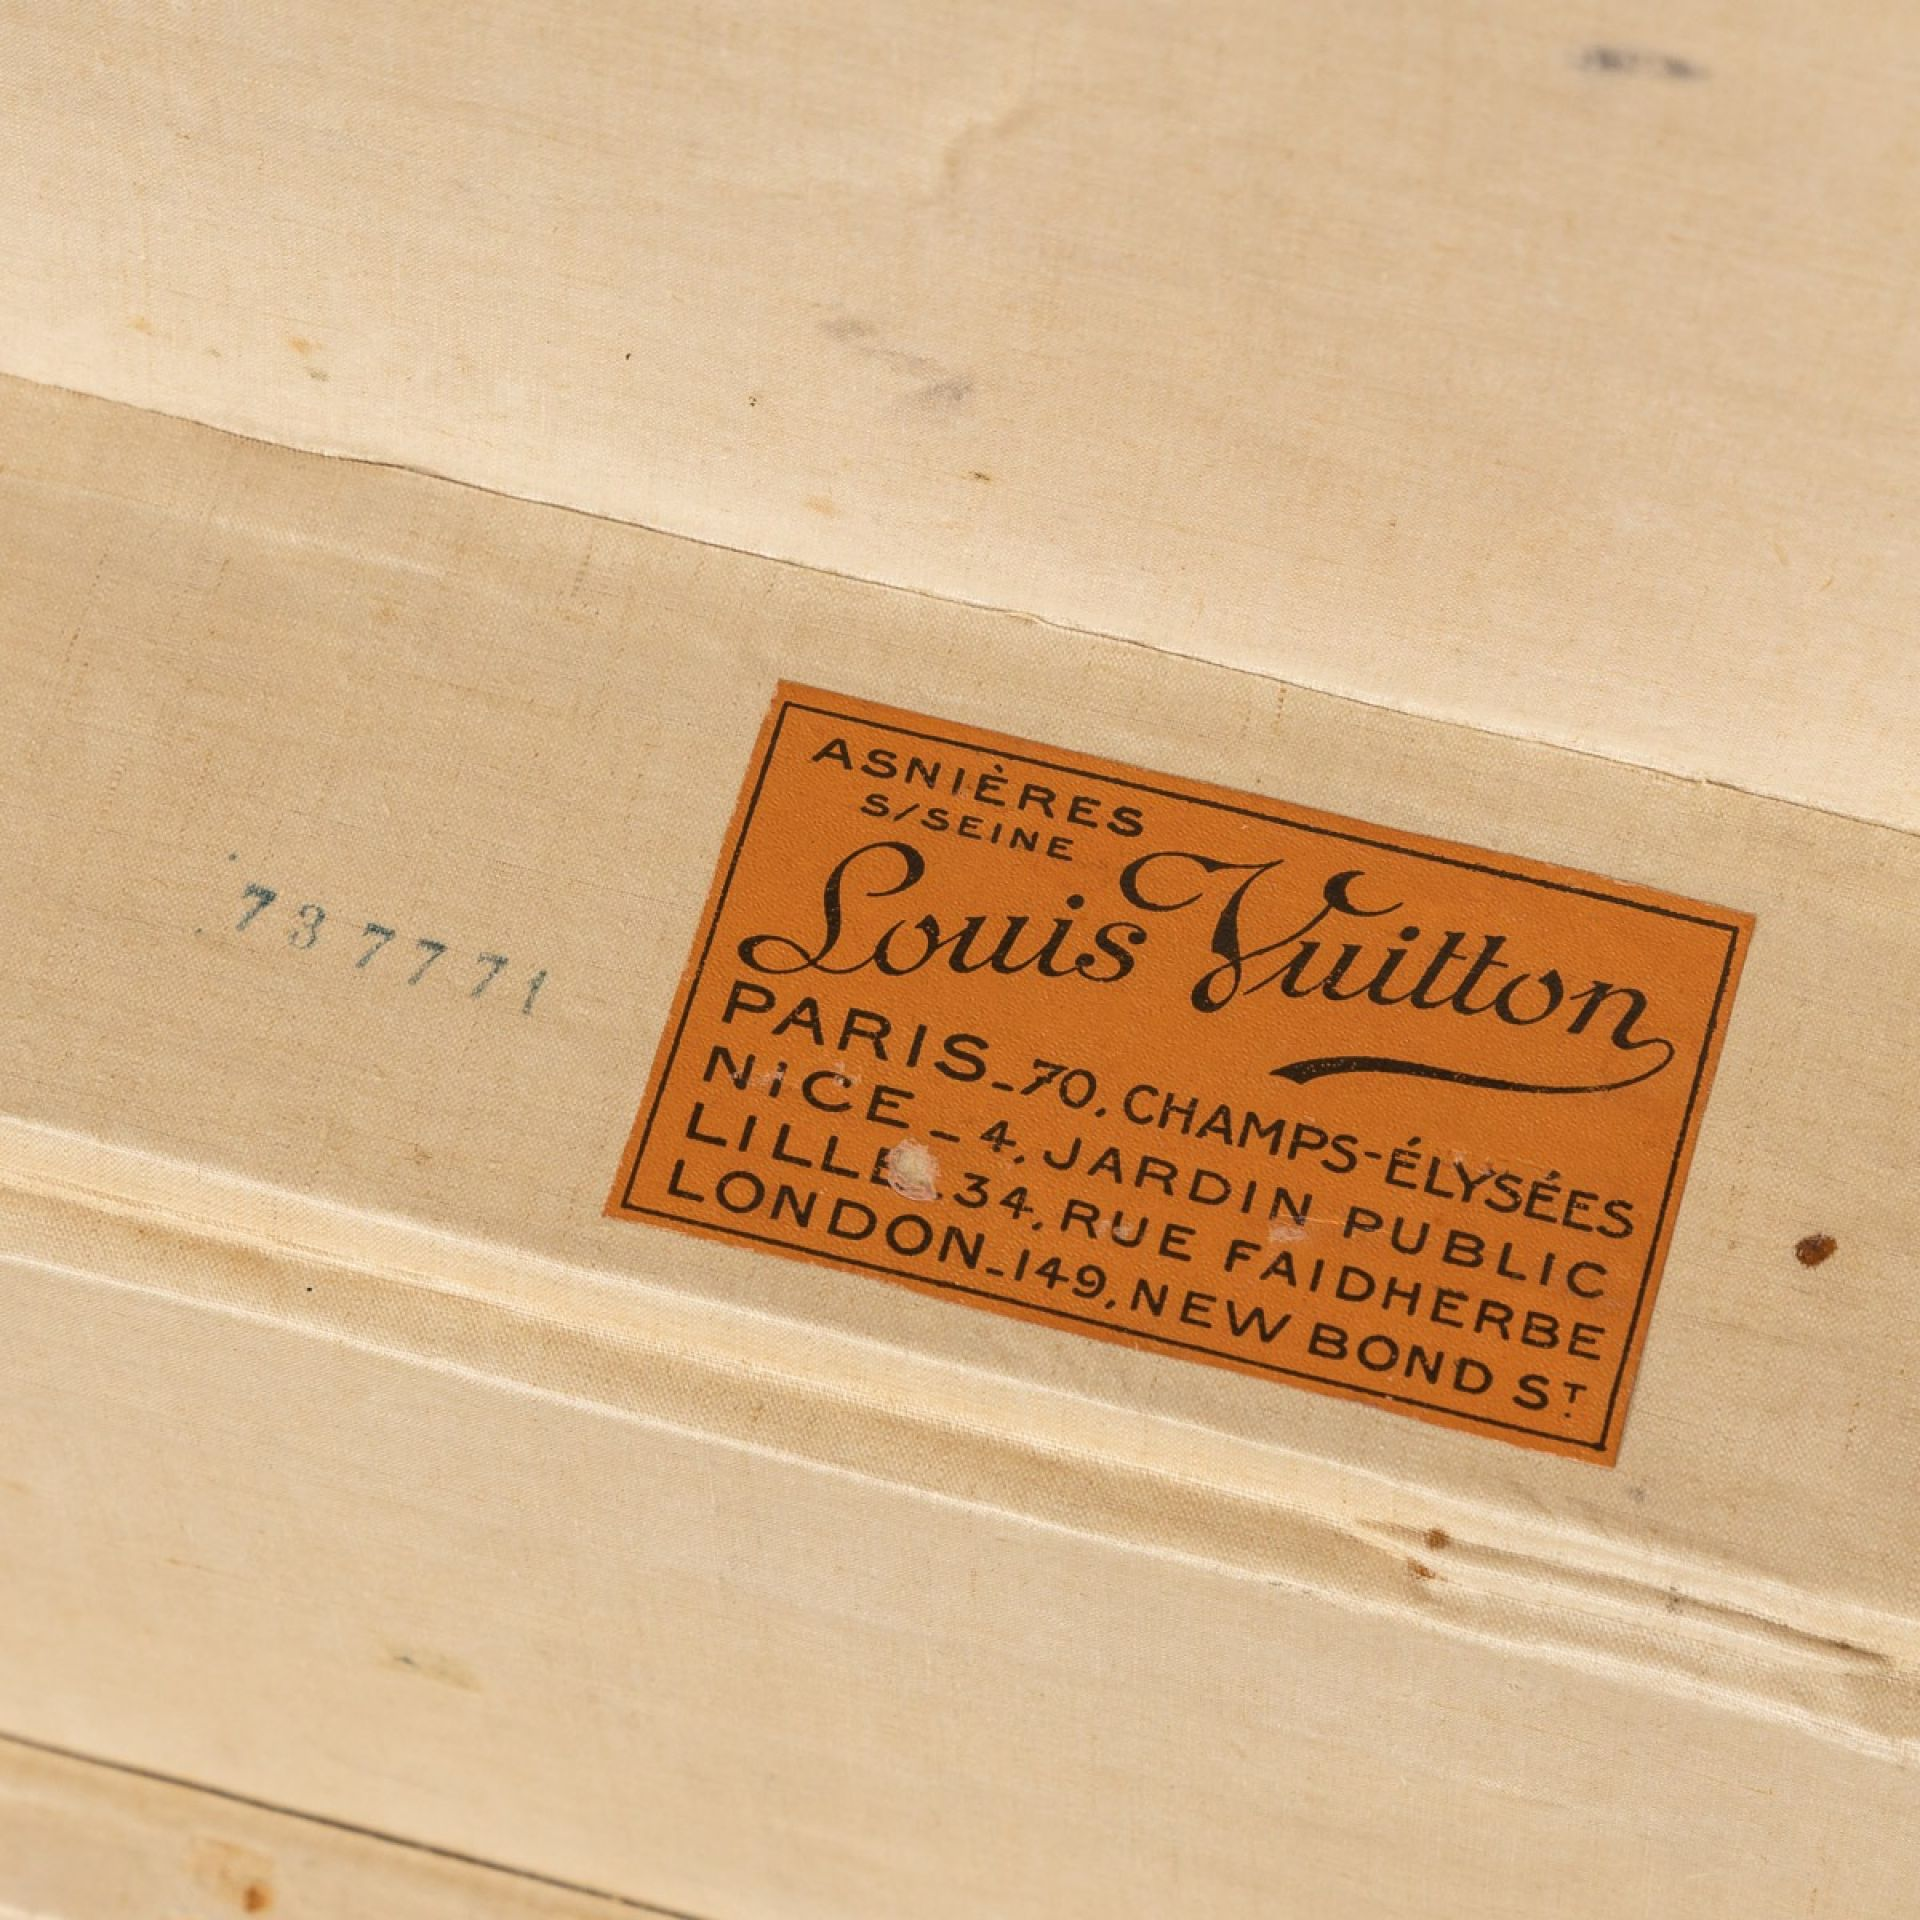 ANTIQUE 20thC LOUIS VUITTON CABIN TRUNK IN MONOGRAMMED CANVAS, FRANCE c.1920